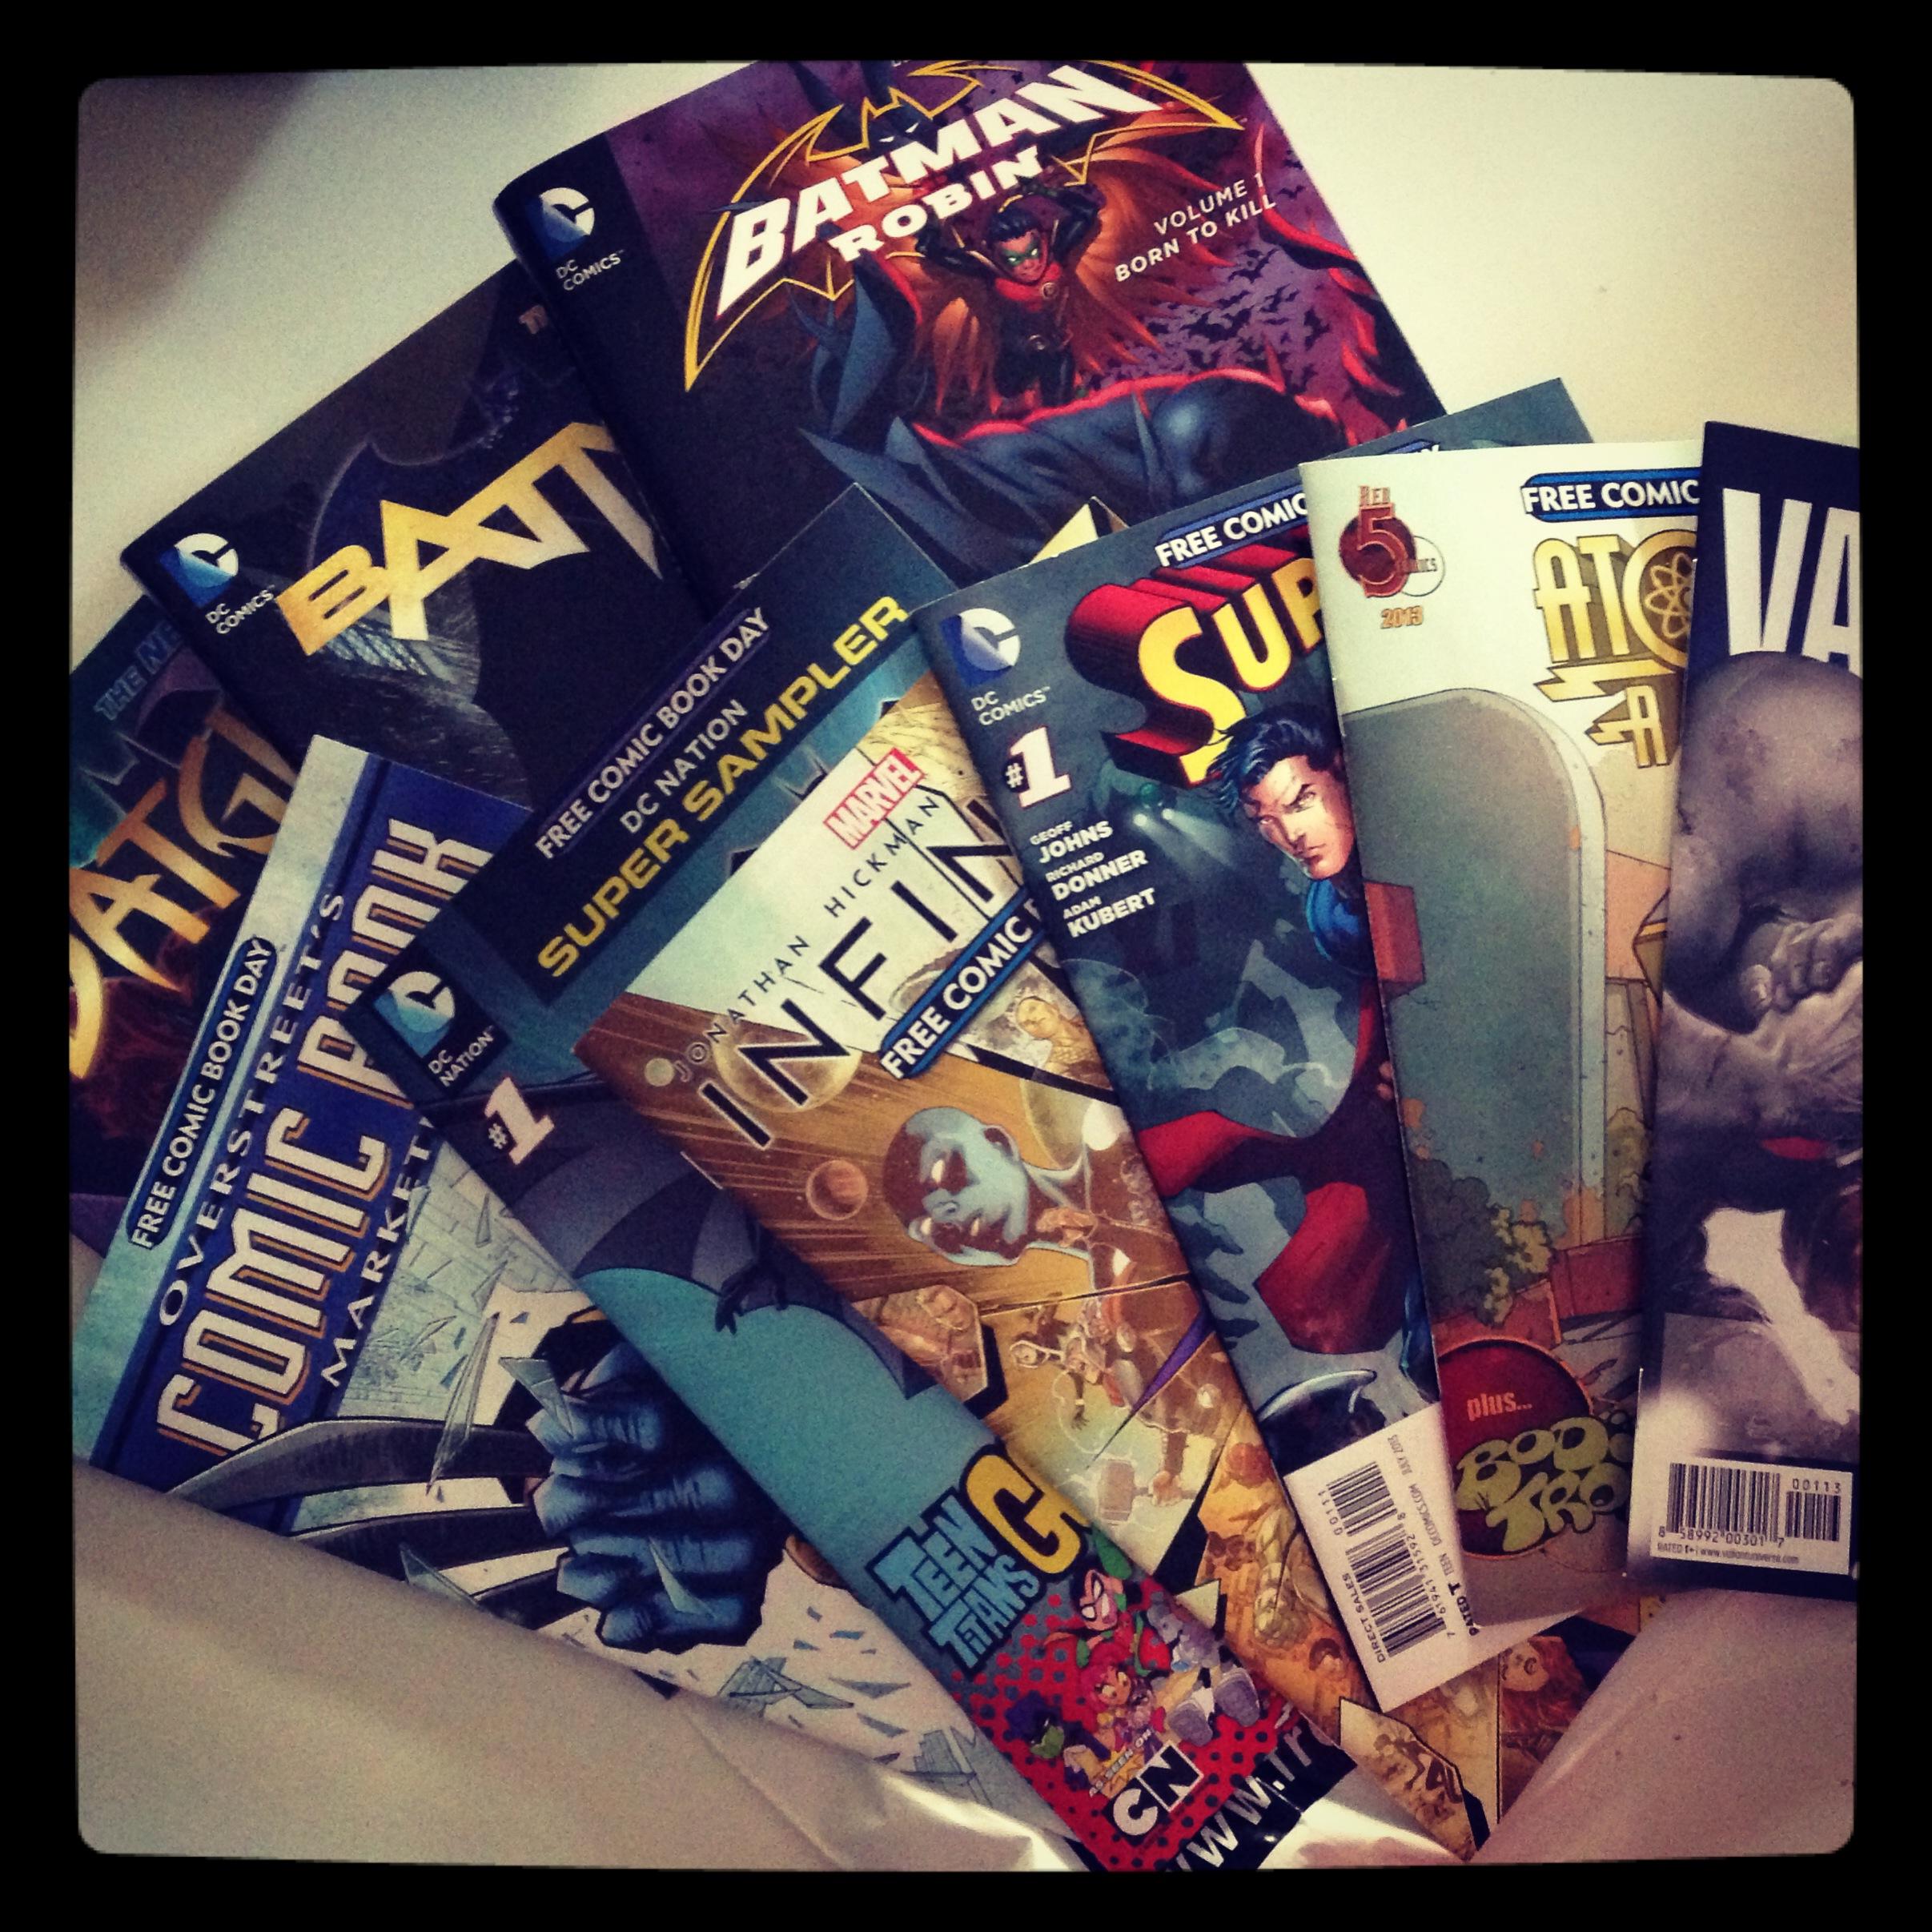 Free Comic Book Day Parramatta: Happy Star Wars Day! (And Free Comic Book Day Too!)